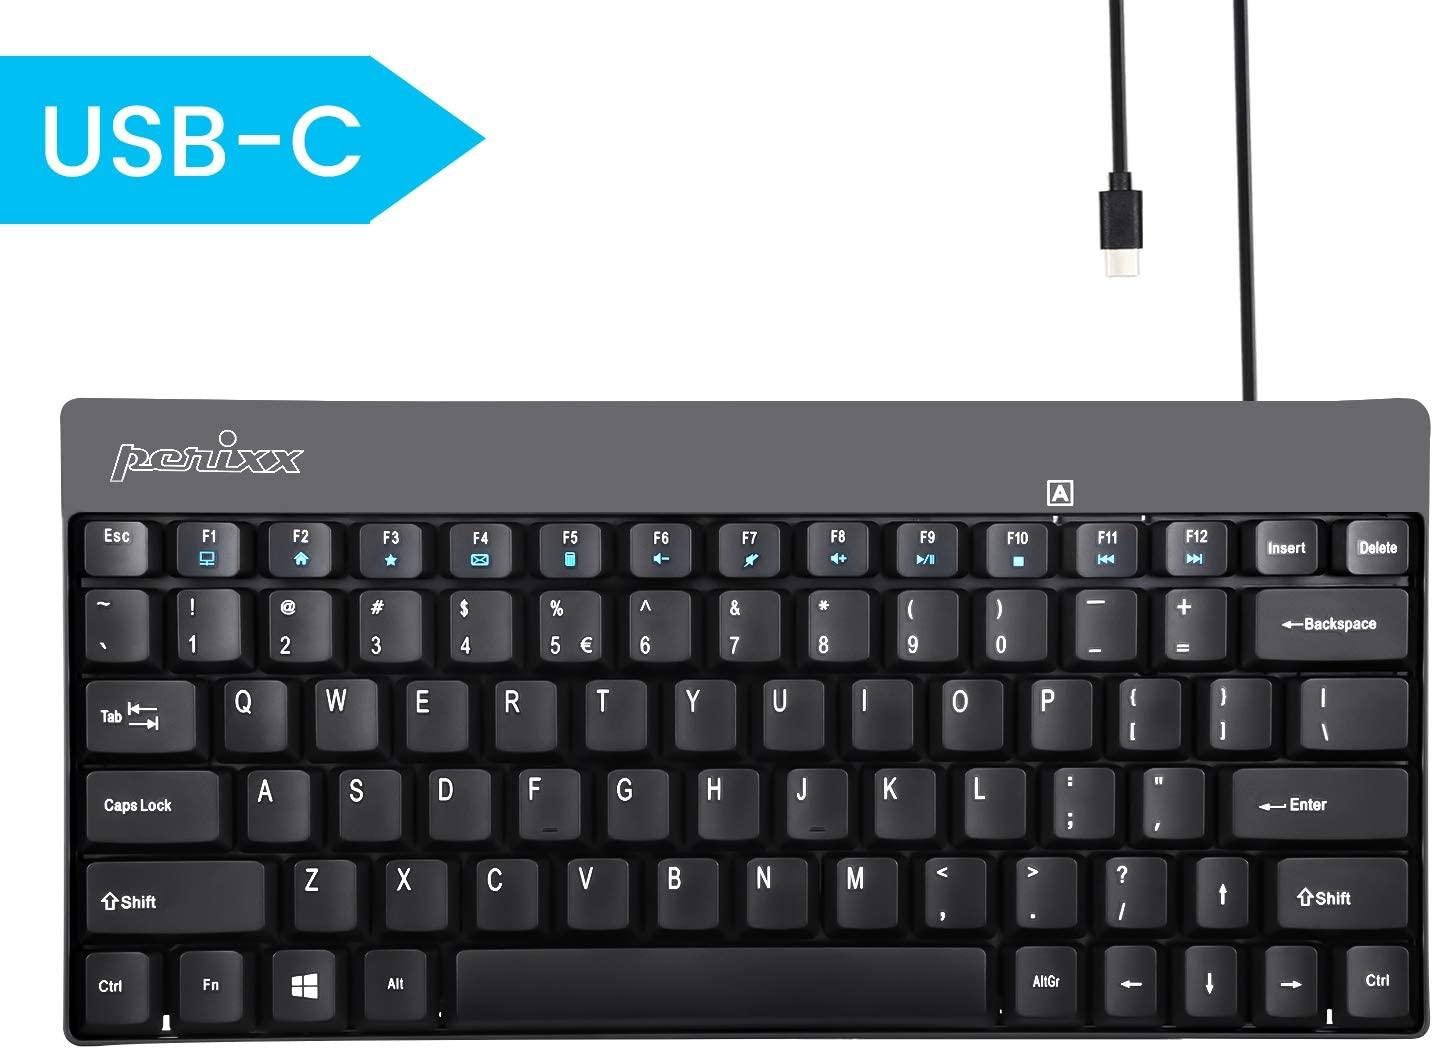 Perixx PERIBOARD-422 Wired USB-C Mini Keyboard, USB Type C Connector, Black